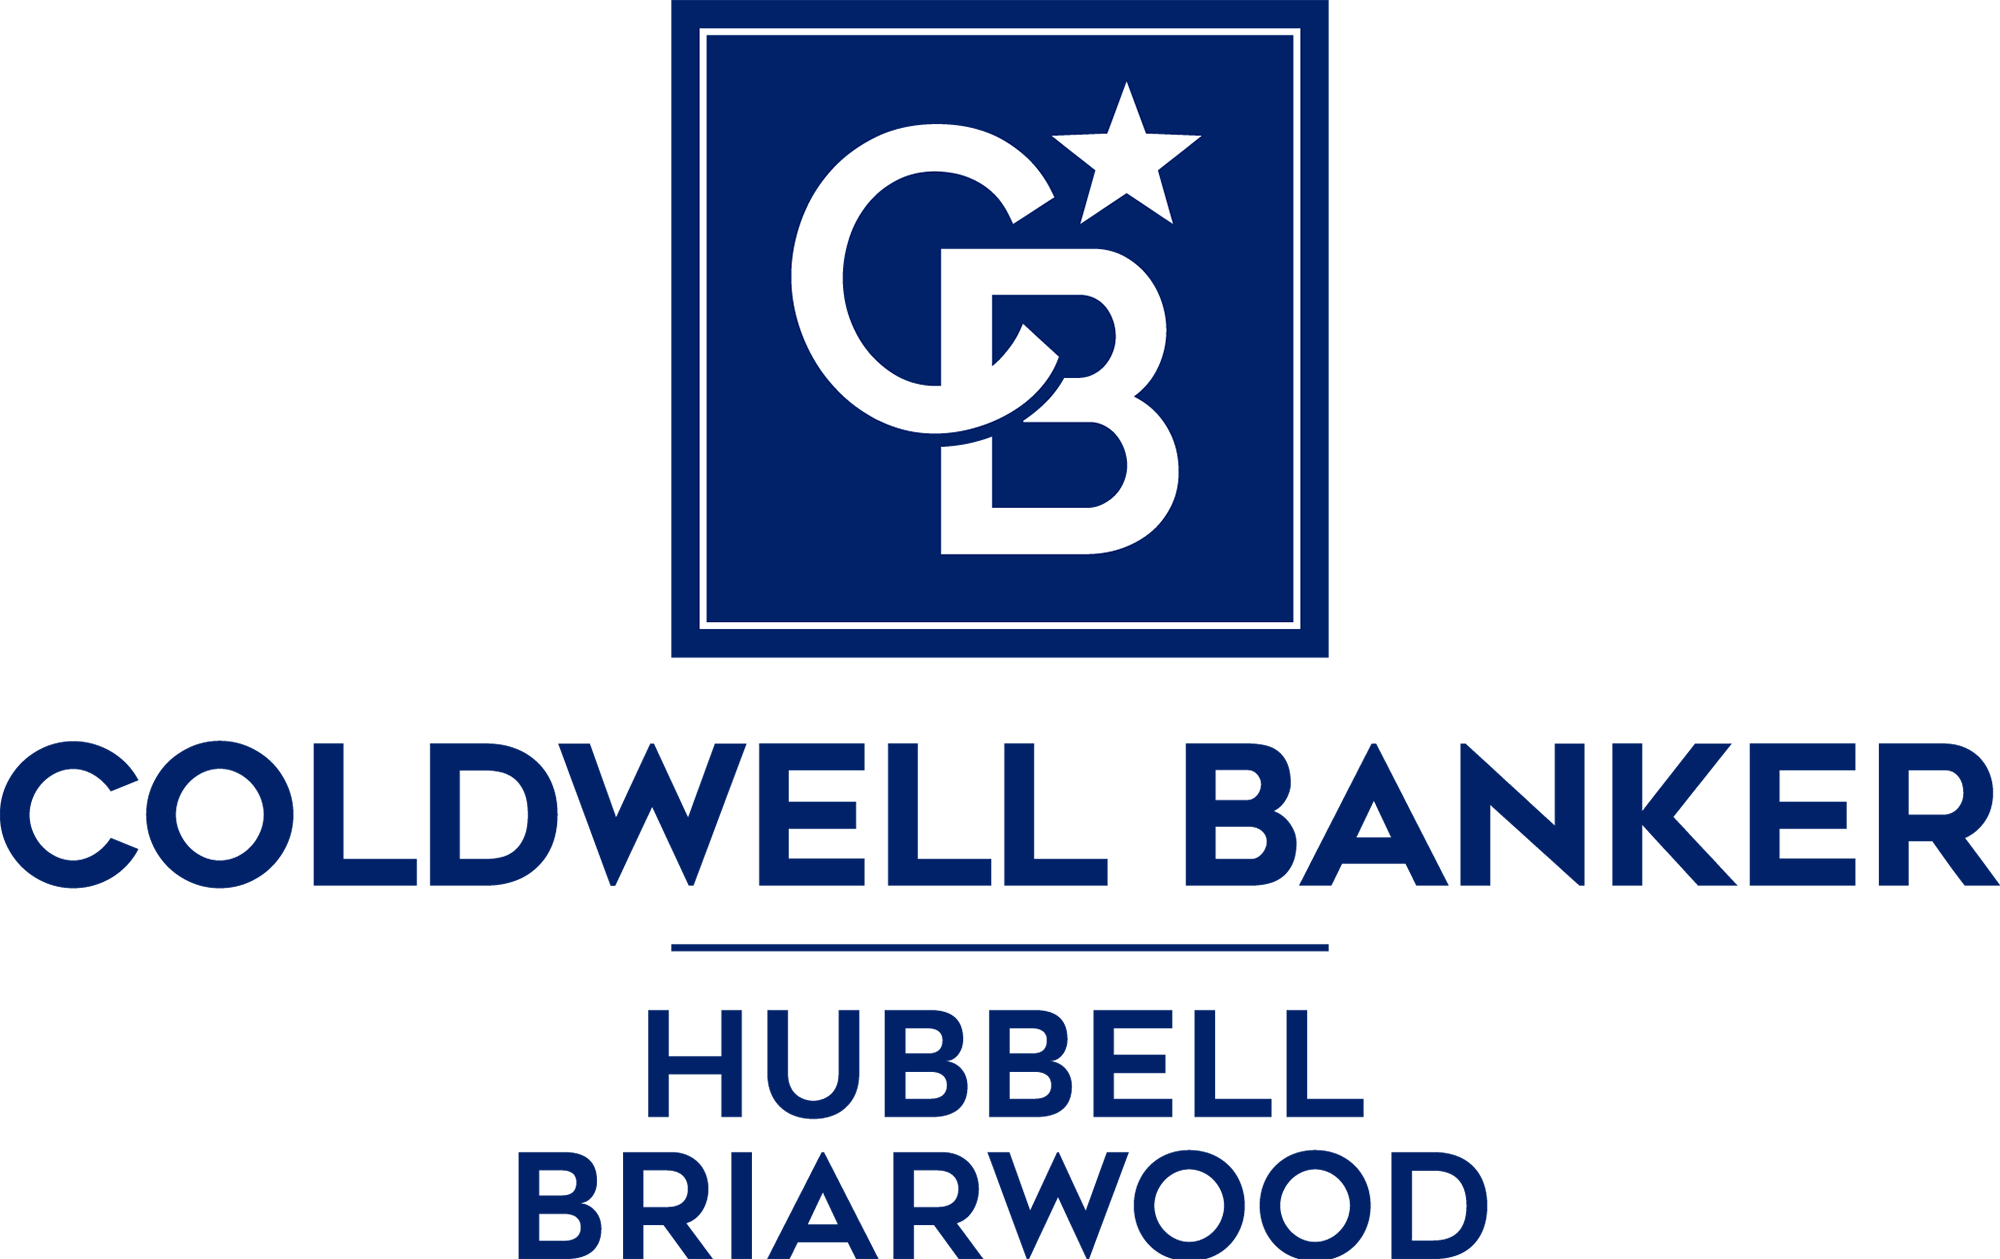 cbhb06 Logo